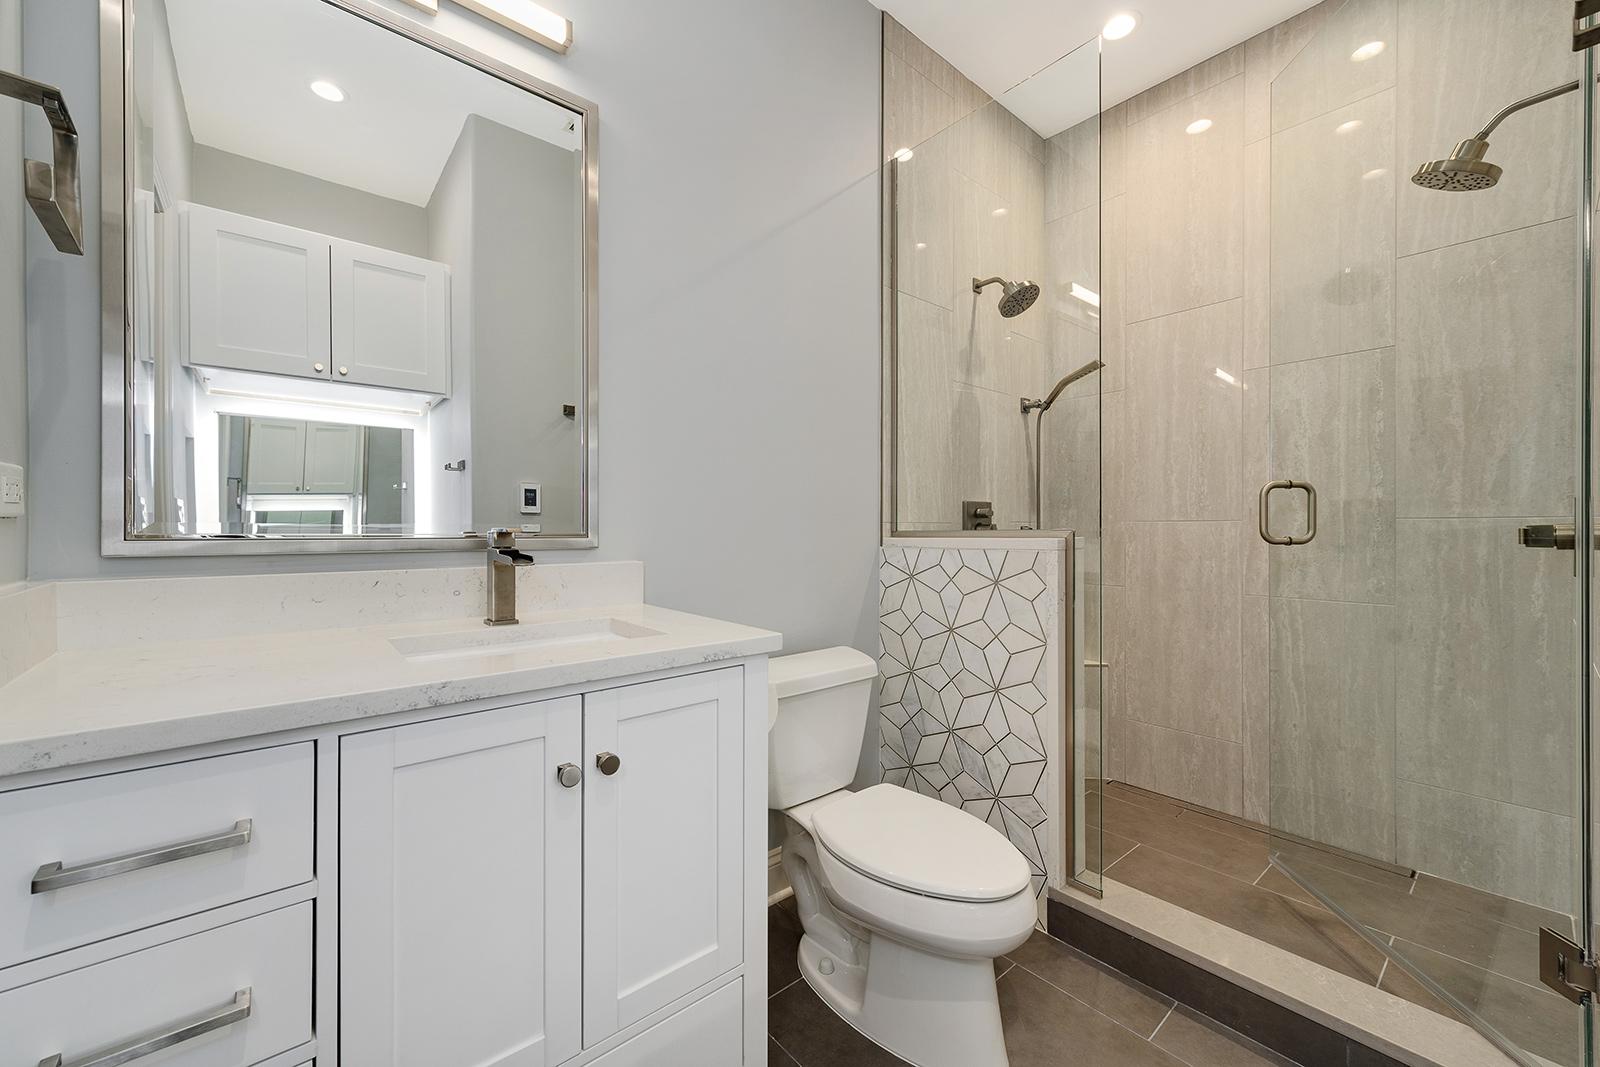 Old Town Master Bathroom Remodel